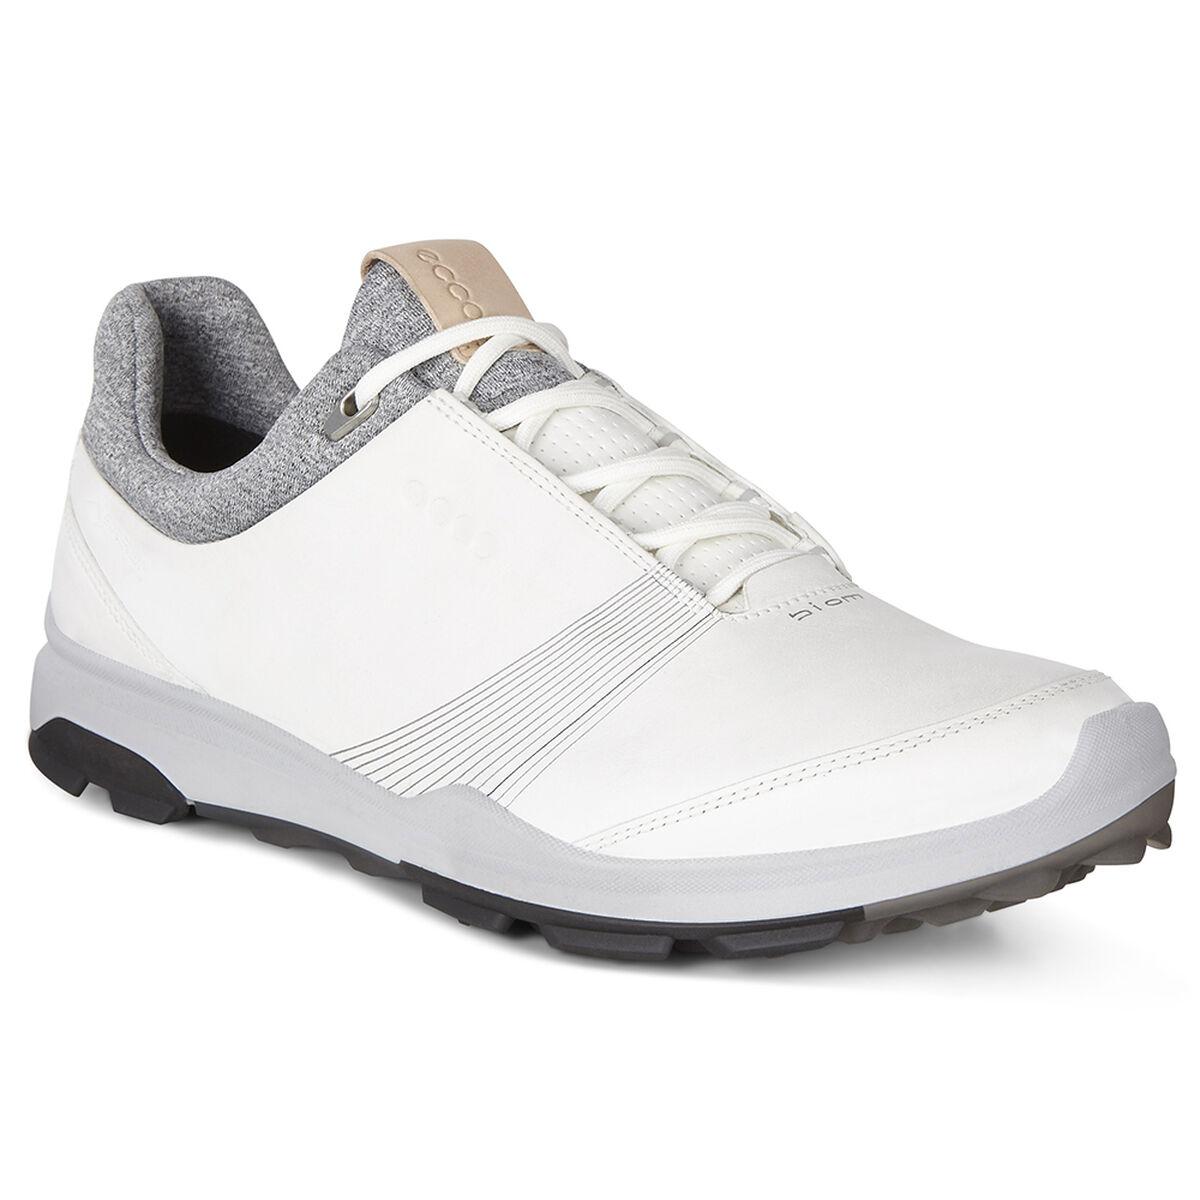 4dcebbee2d59 ECCO BIOM Hybrid 3 GTX Women s Golf Shoe - White Black